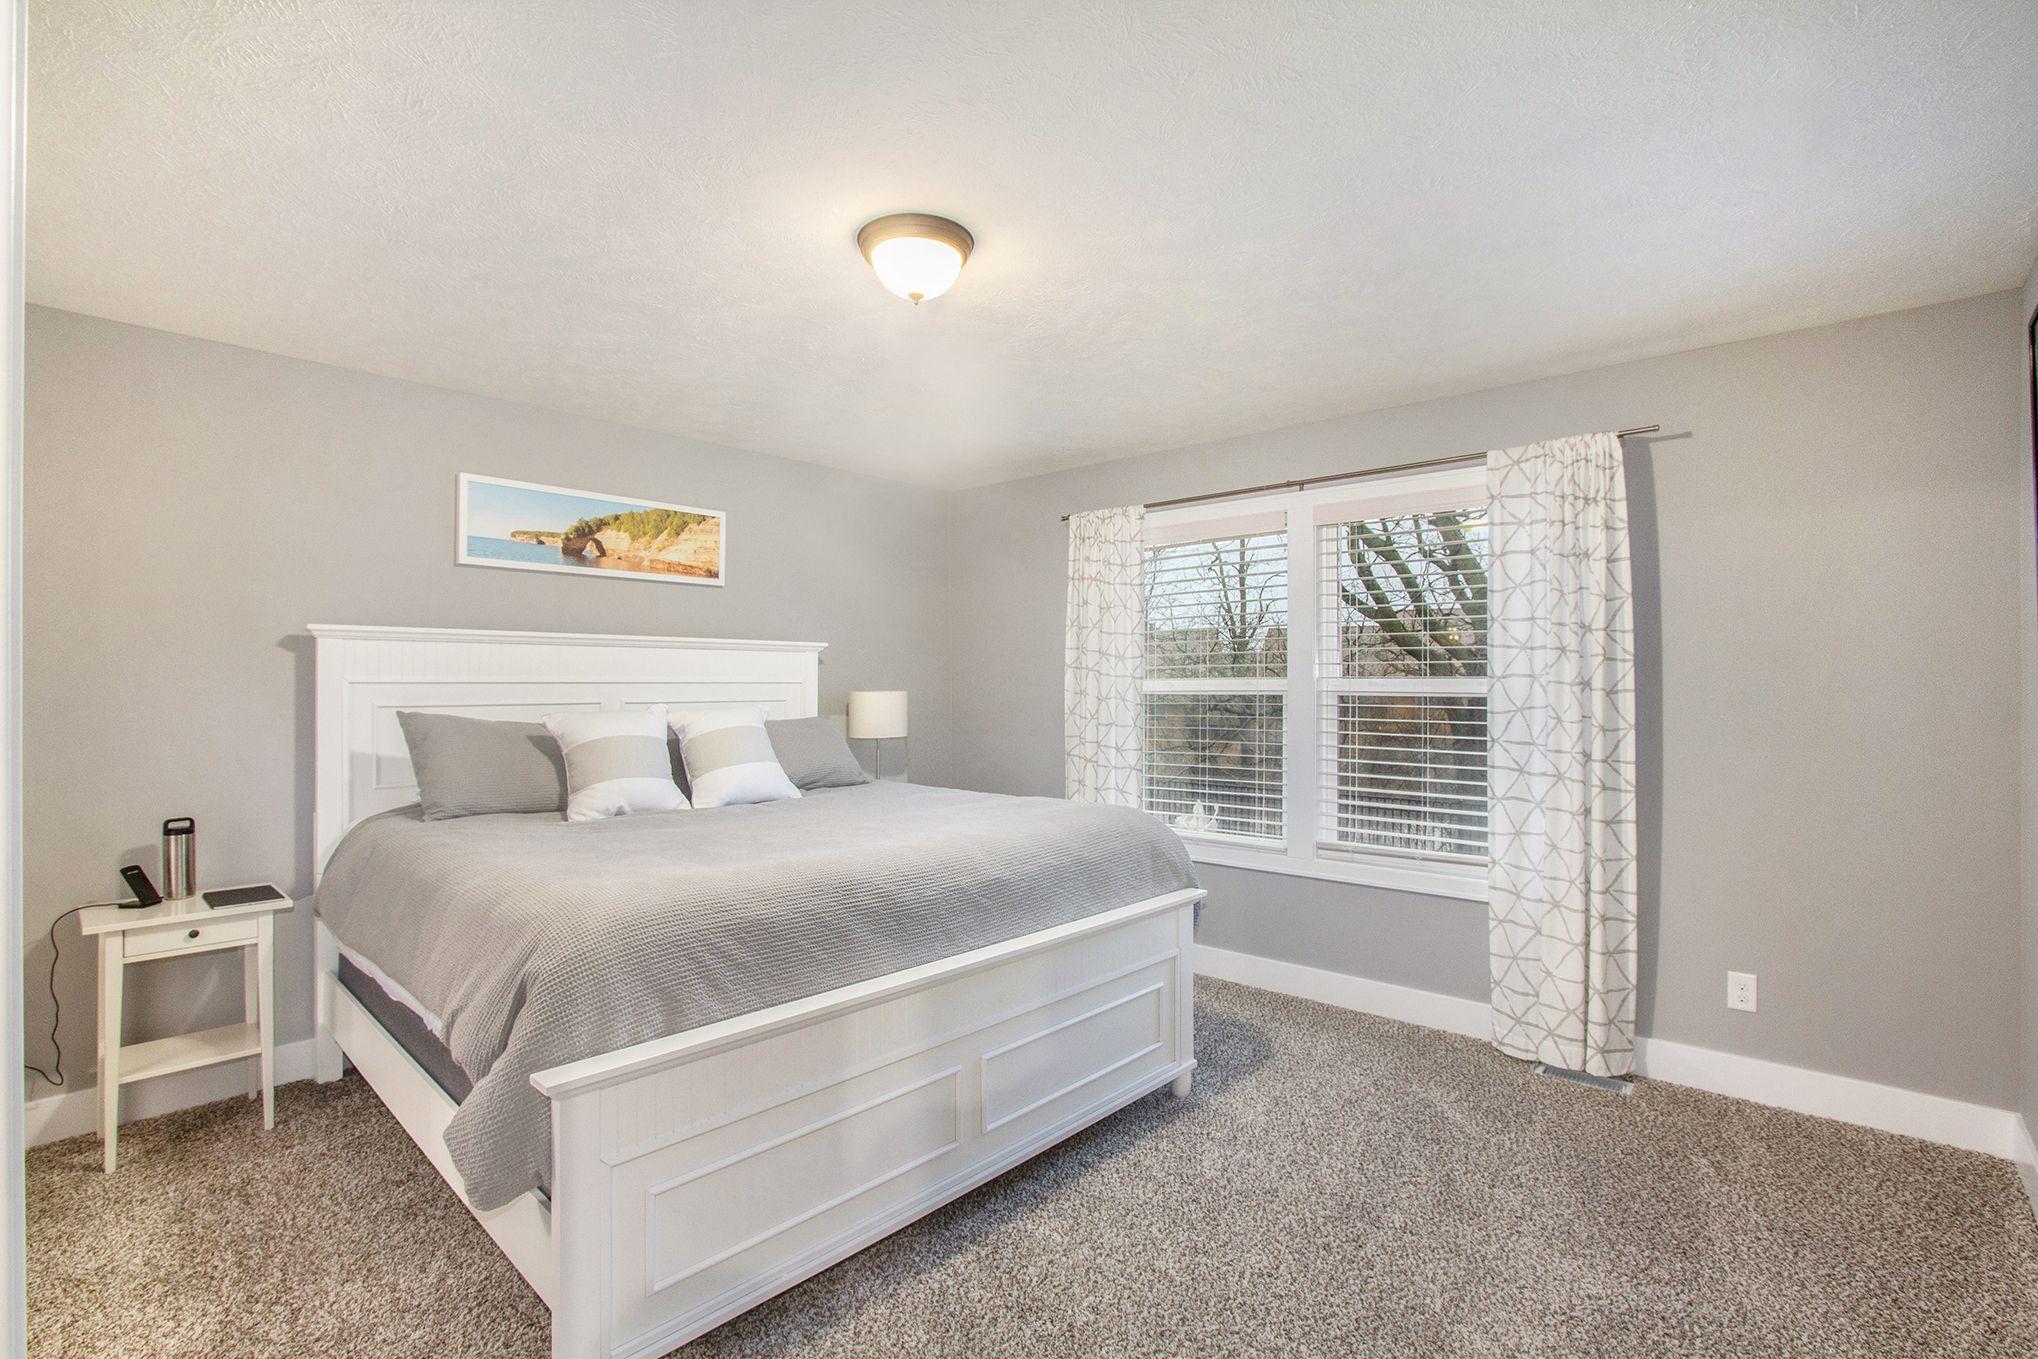 Bedroom featured in The Georgetown By Eastbrook Homes Inc. in Lansing, MI